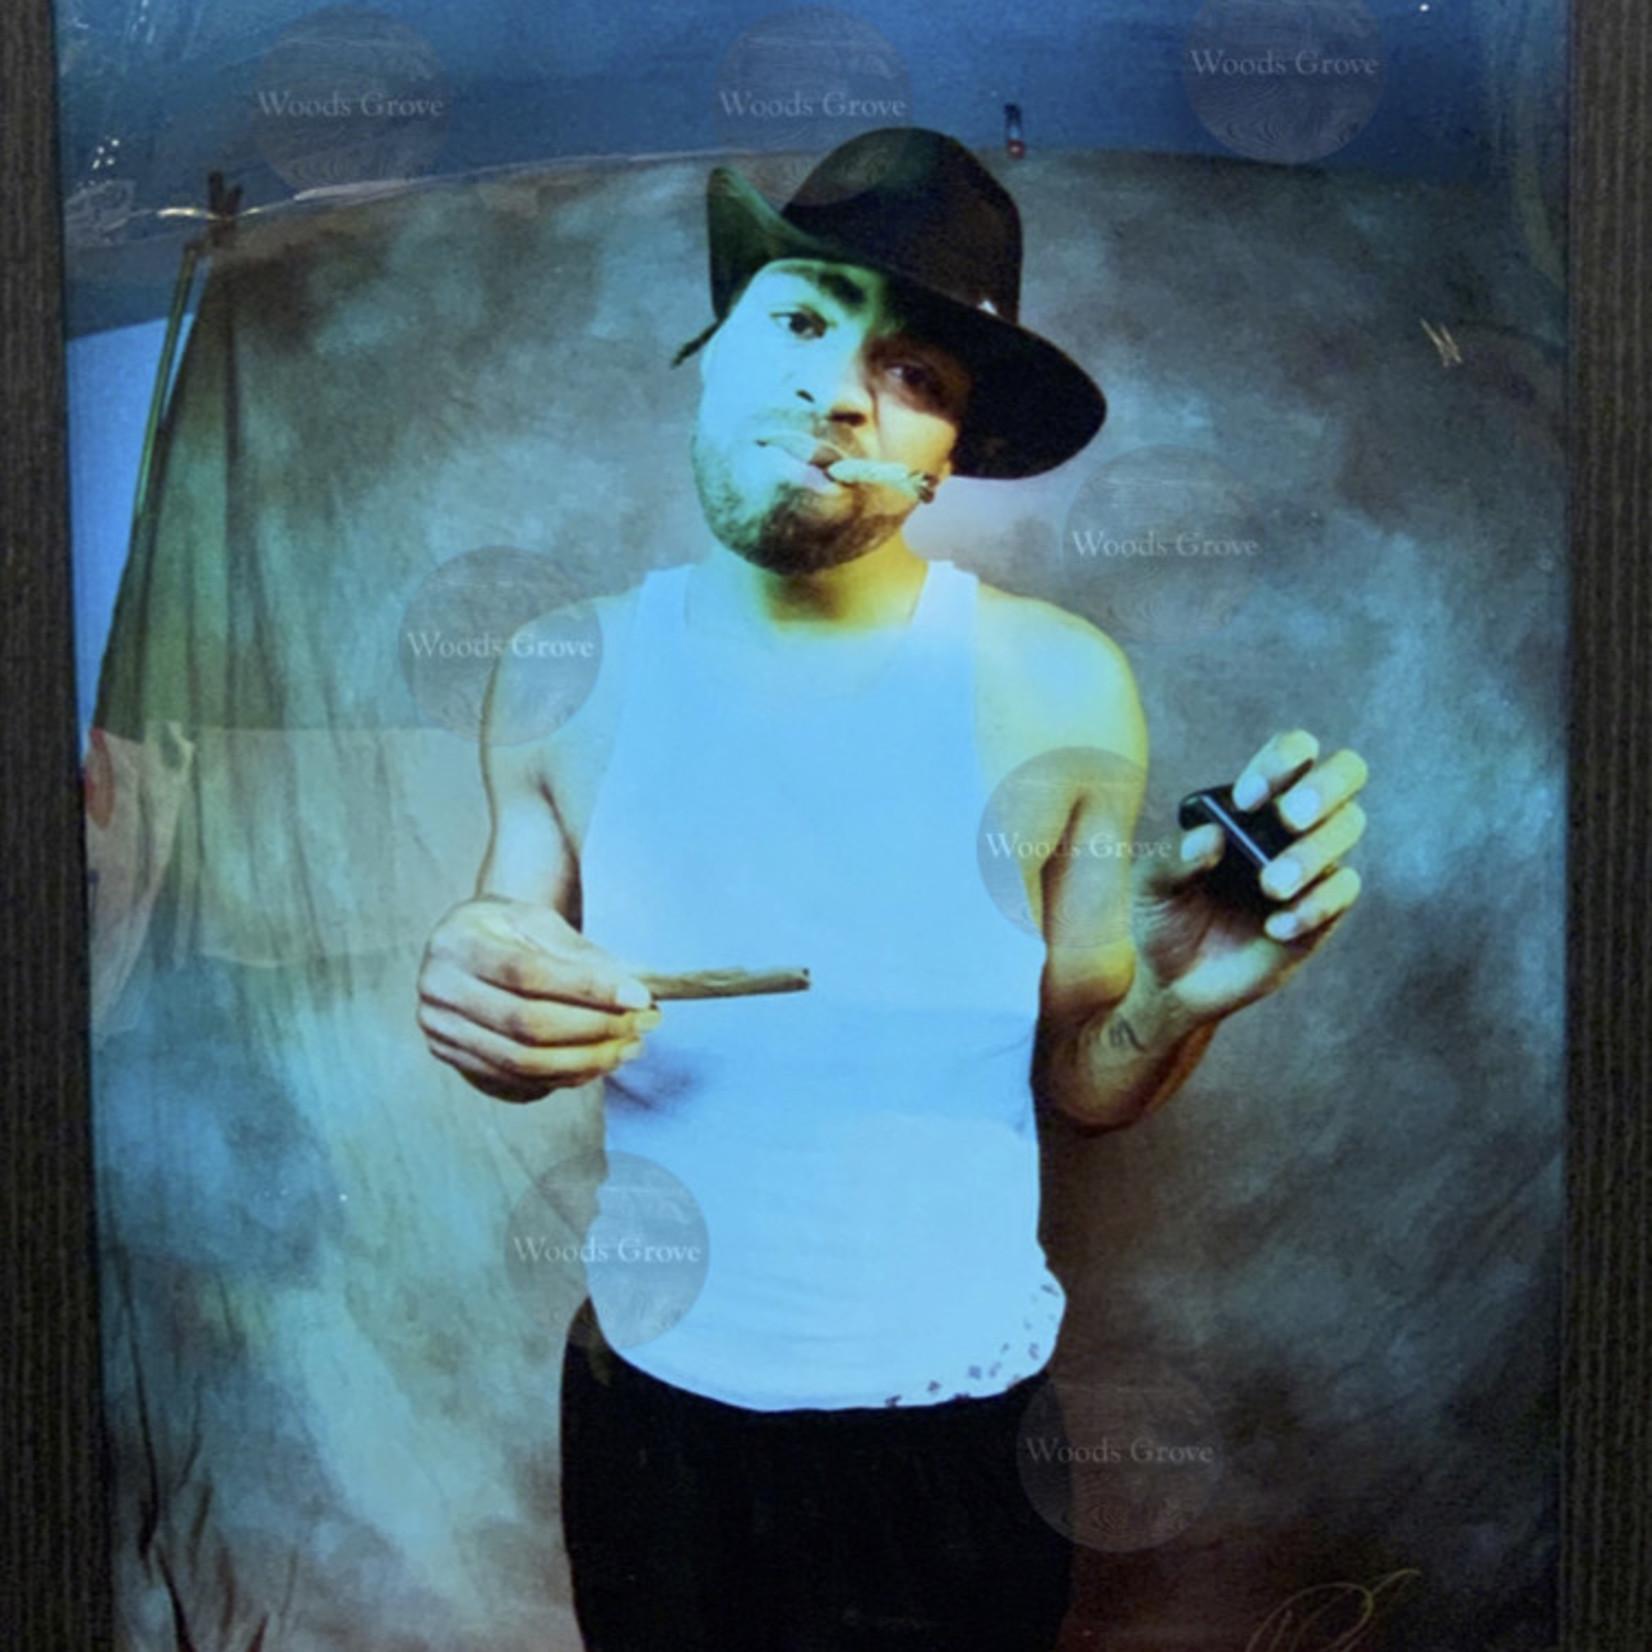 DiChiaro Photography Wu-Tang Clan Method Man